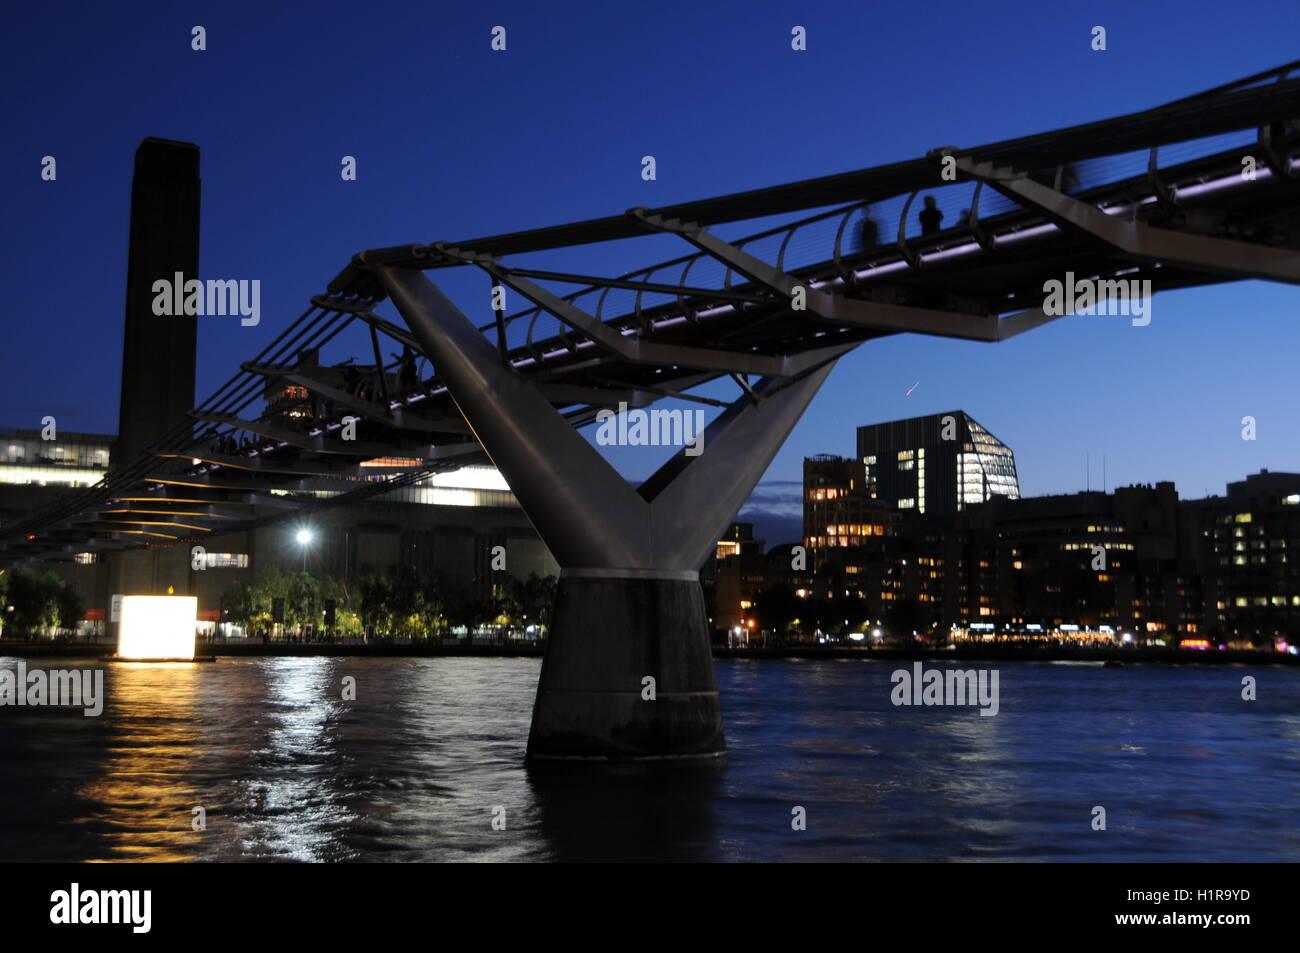 A horizontal image of London's Millennium Bridge, at night. - Stock Image